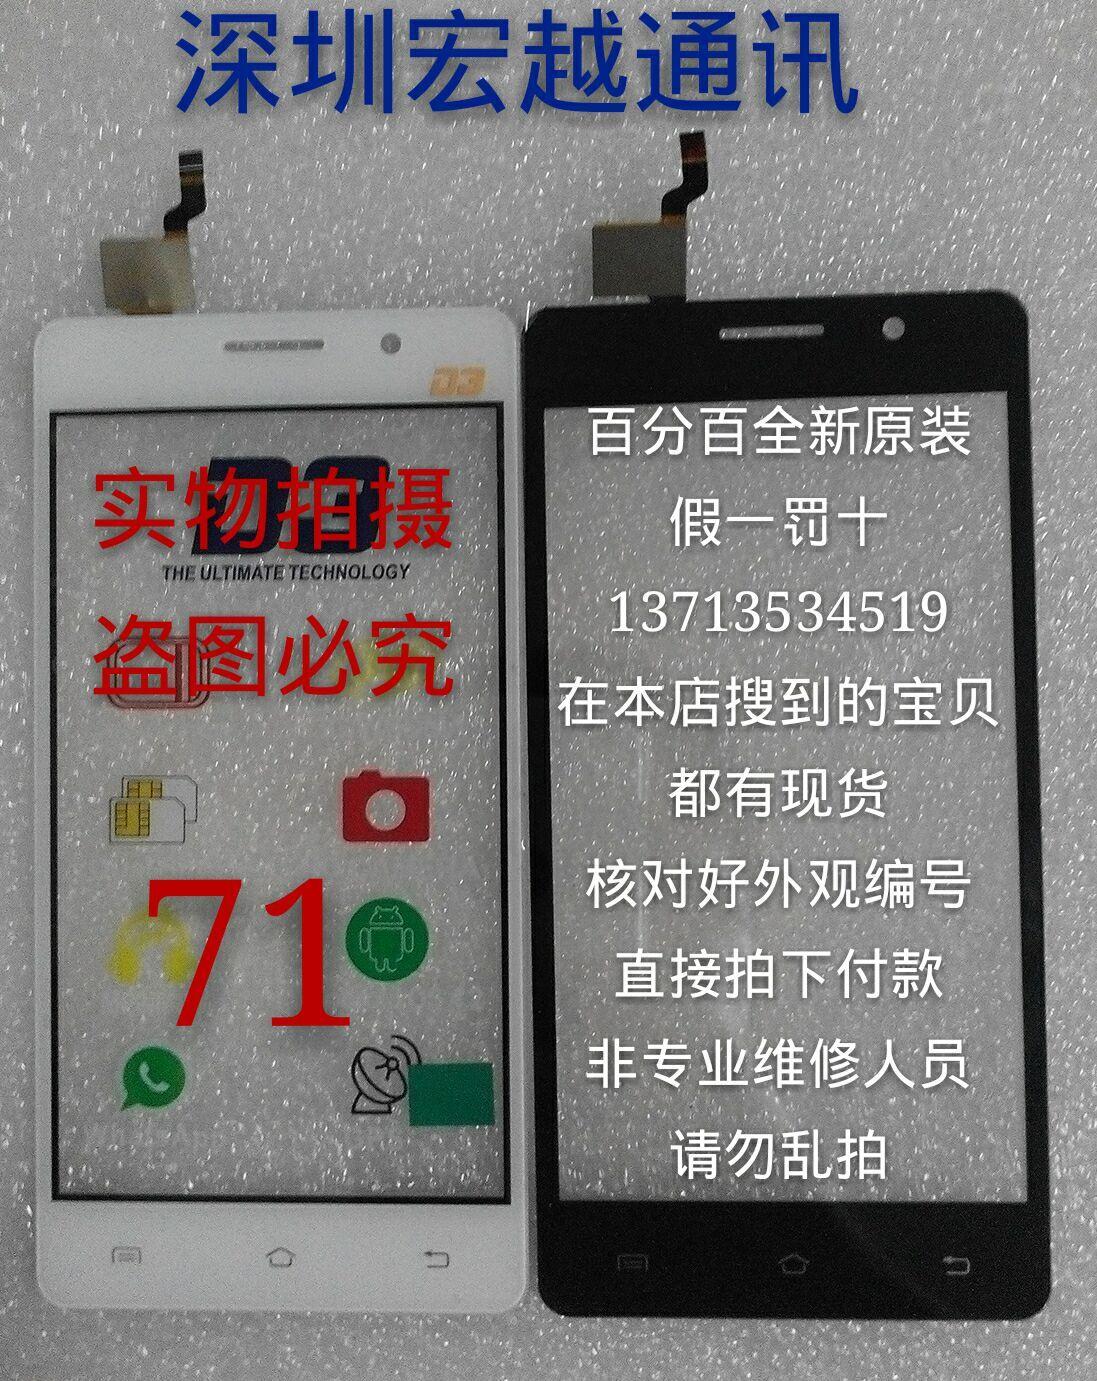 Новый оригинальный сенсорный экран почерка FR-A6-V1/V0 экран FR-A6-V1/V0